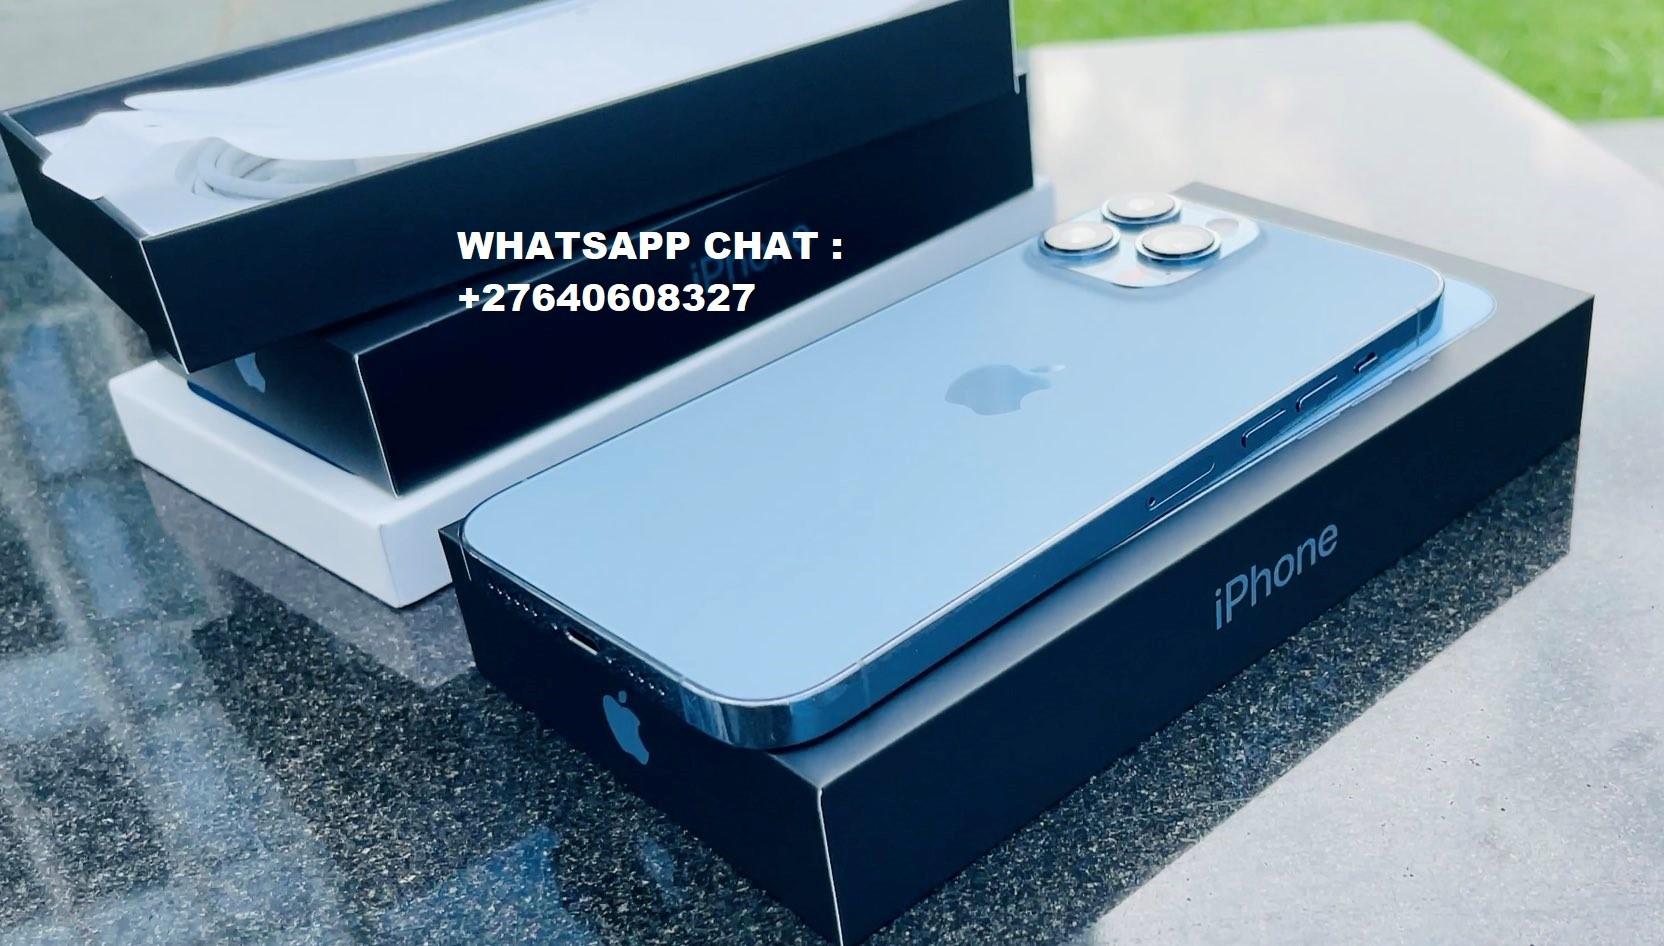 Apple iPhone 13 Pro, iPhone 13 Pro Max, iPhone 13